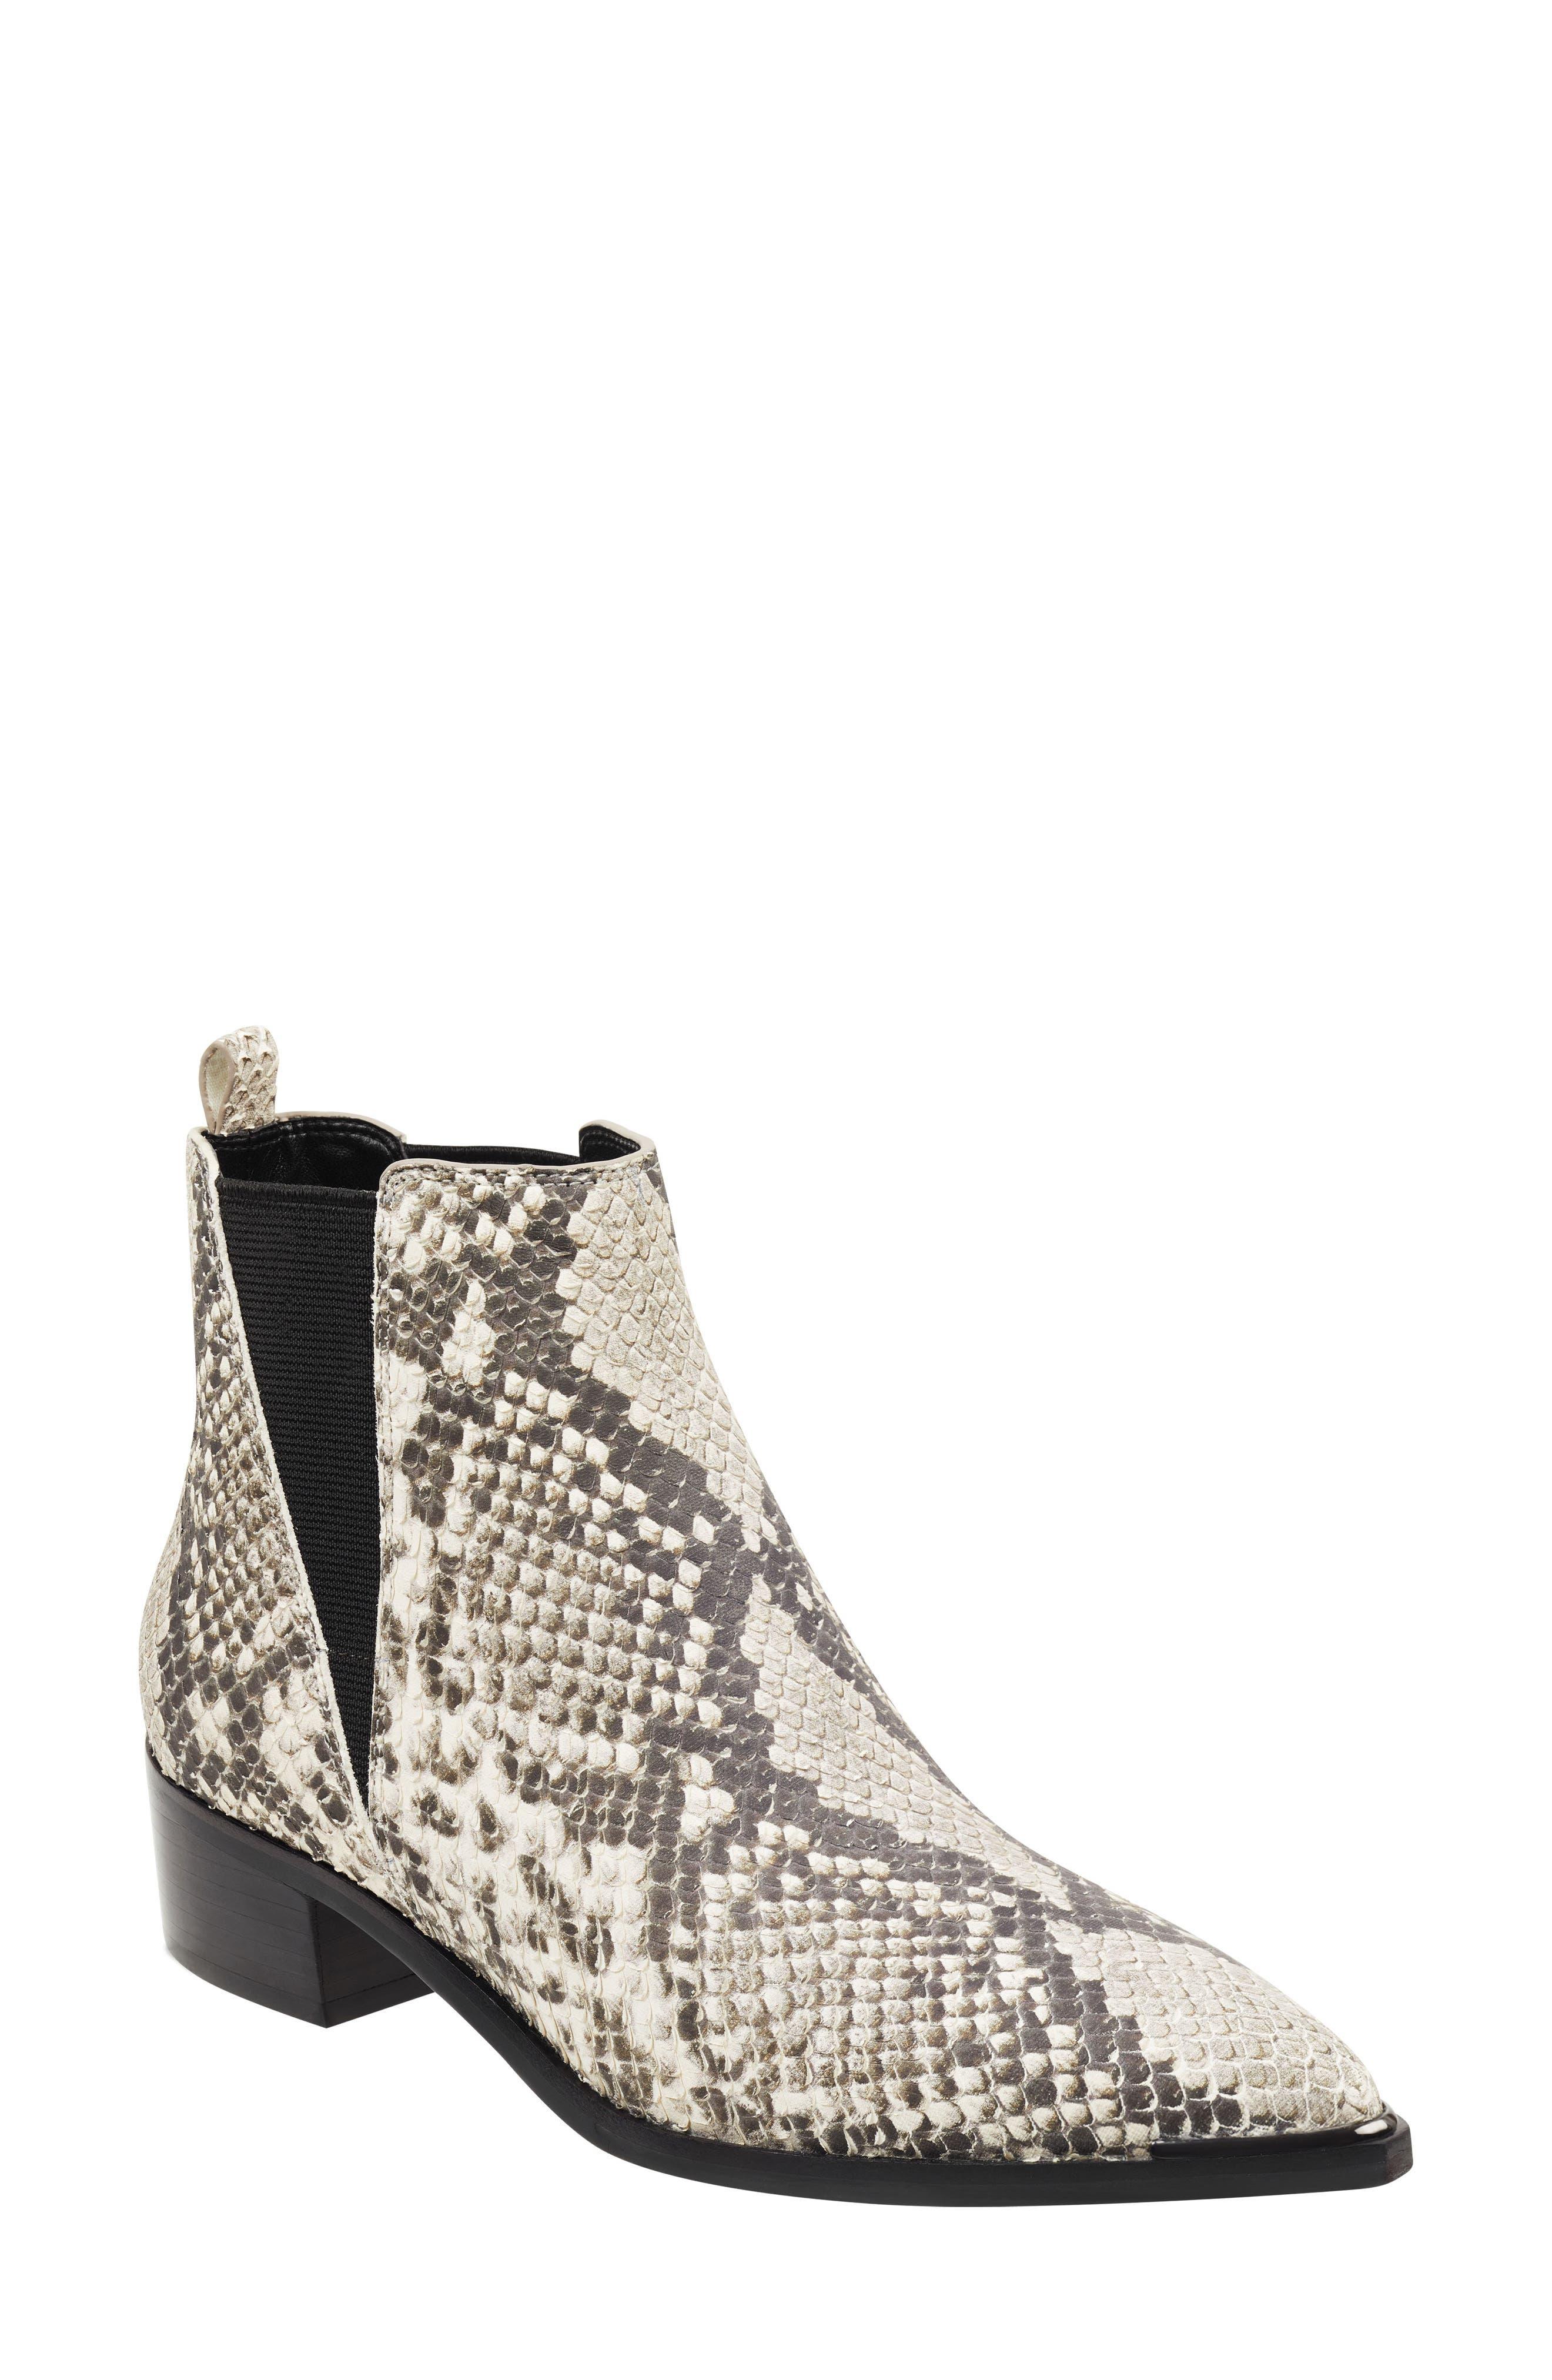 9add59e300b Women's Marc Fisher LTD Shoes | Nordstrom